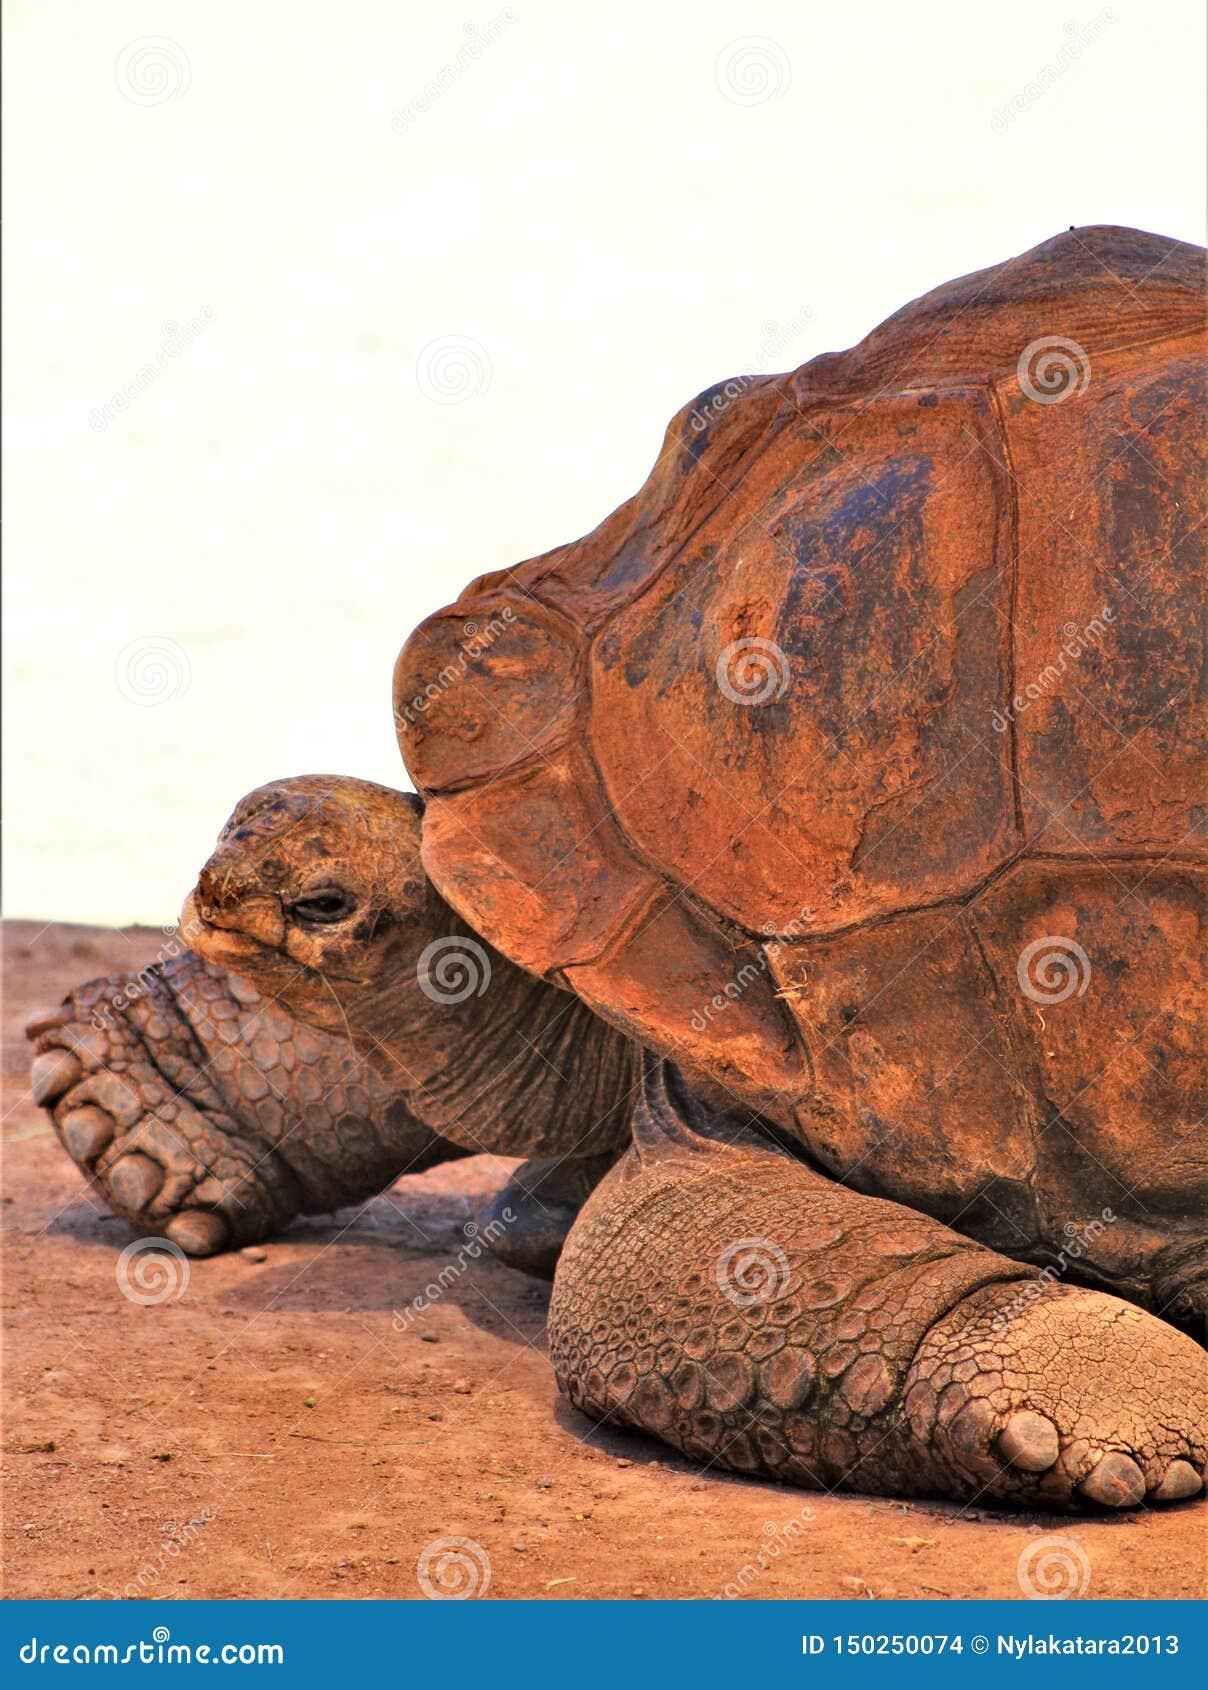 Aldabra Giant Tortoise, Phoenix Zoo, Arizona Center for Nature Conservation, Phoenix, Arizona, United States